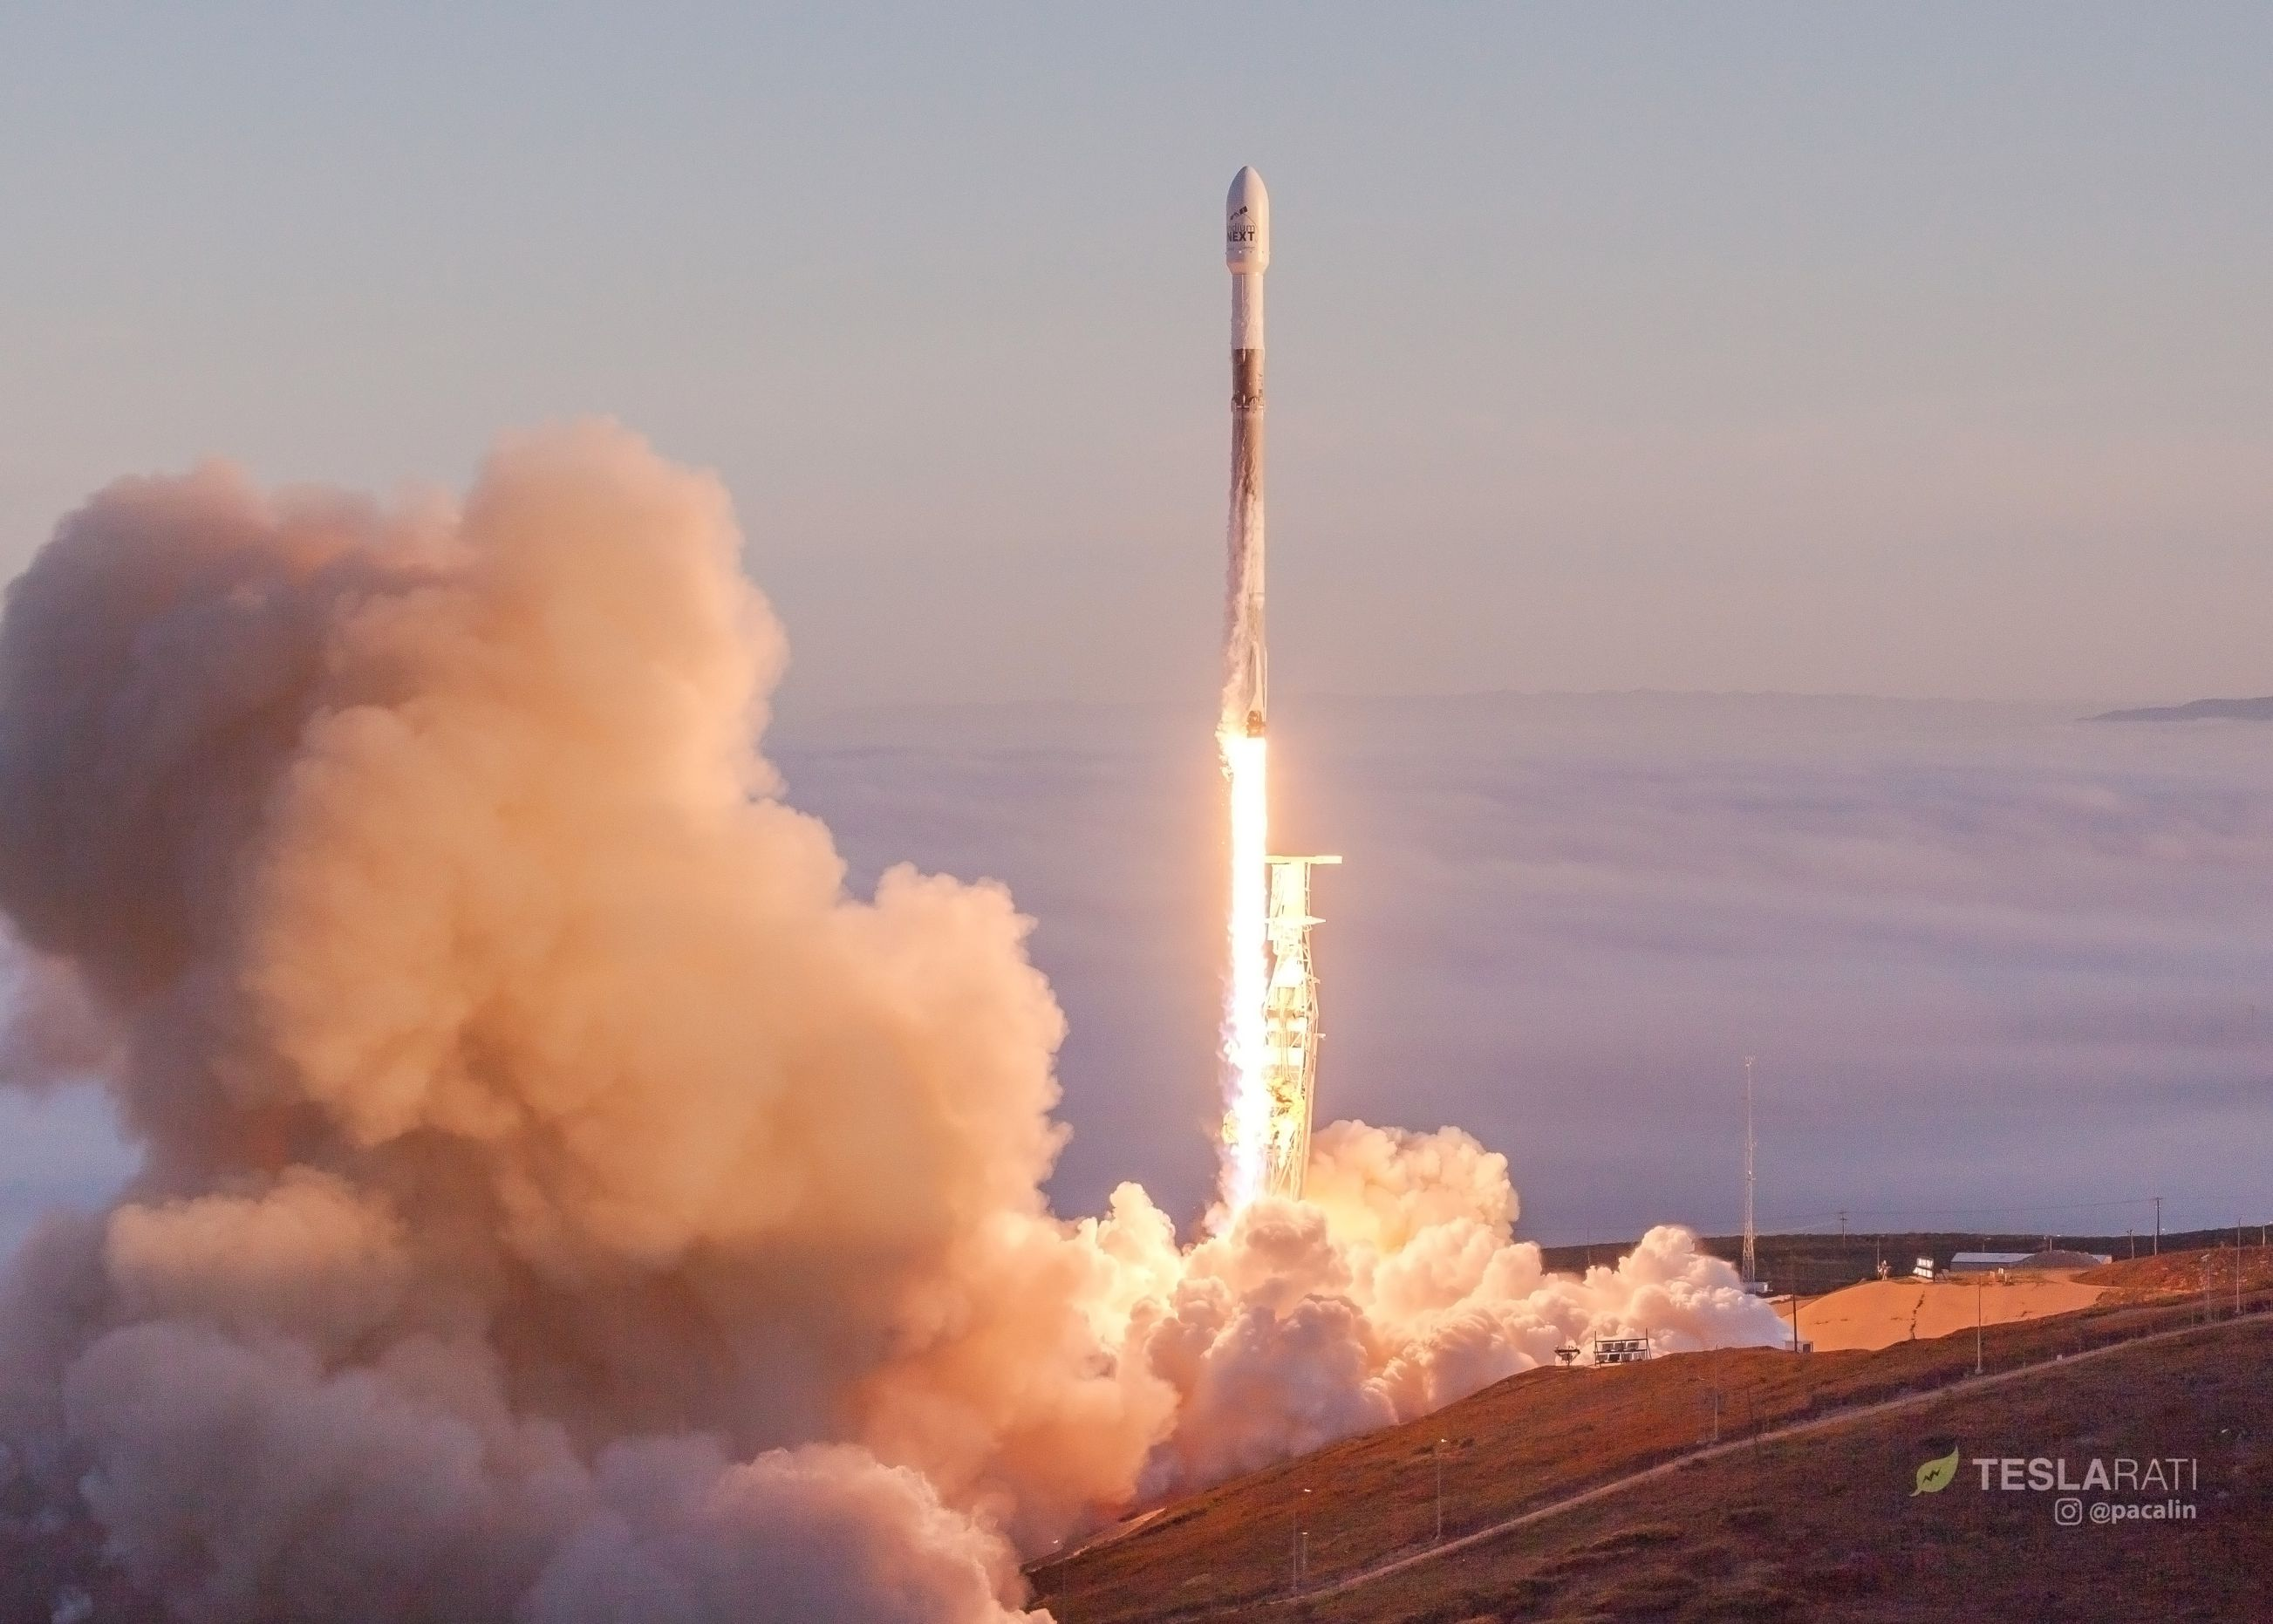 Falcon 9 1041 rises from a sea of fog (Pauline Acalin)(c)